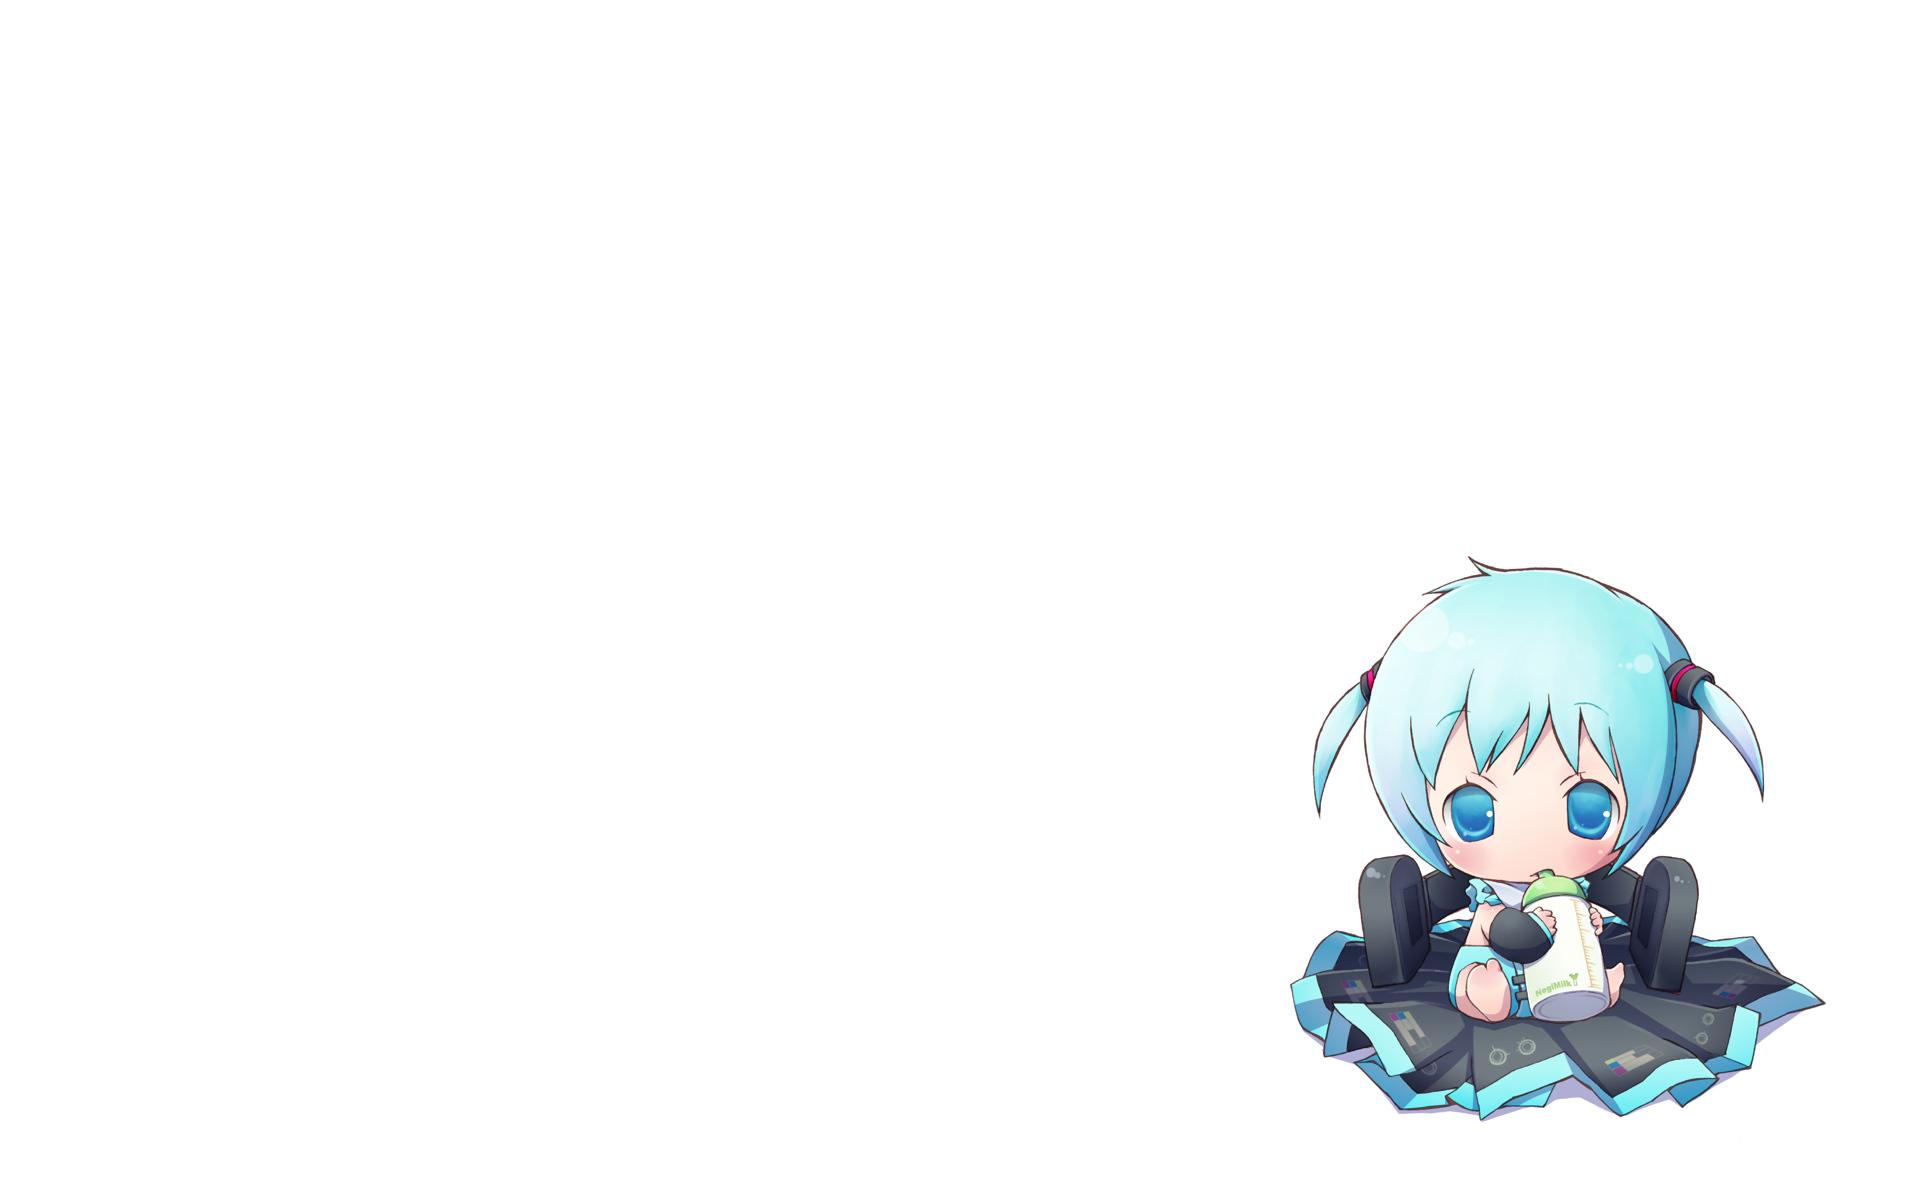 chibi chitose_kiiro hatsune_miku twintails vocaloid white